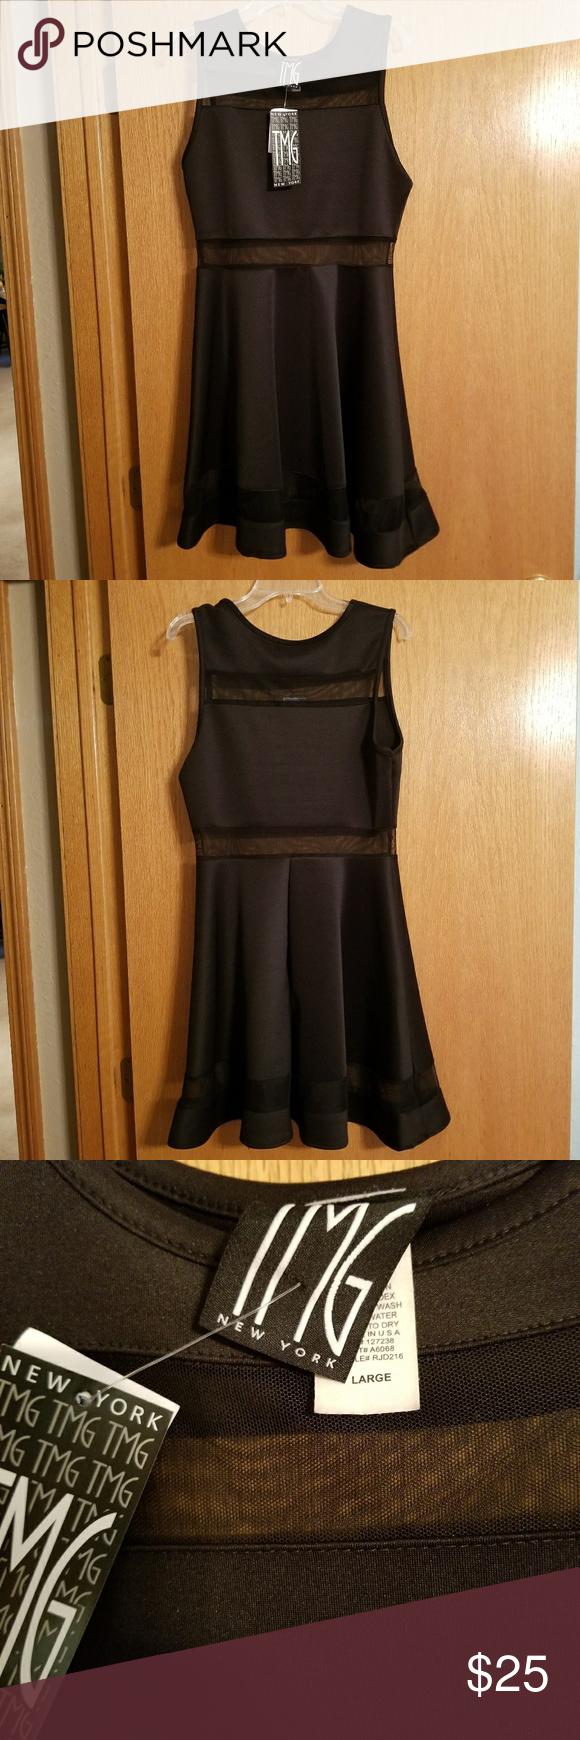 Nwt little black mesh dress nwt mesh dress black mesh and dress